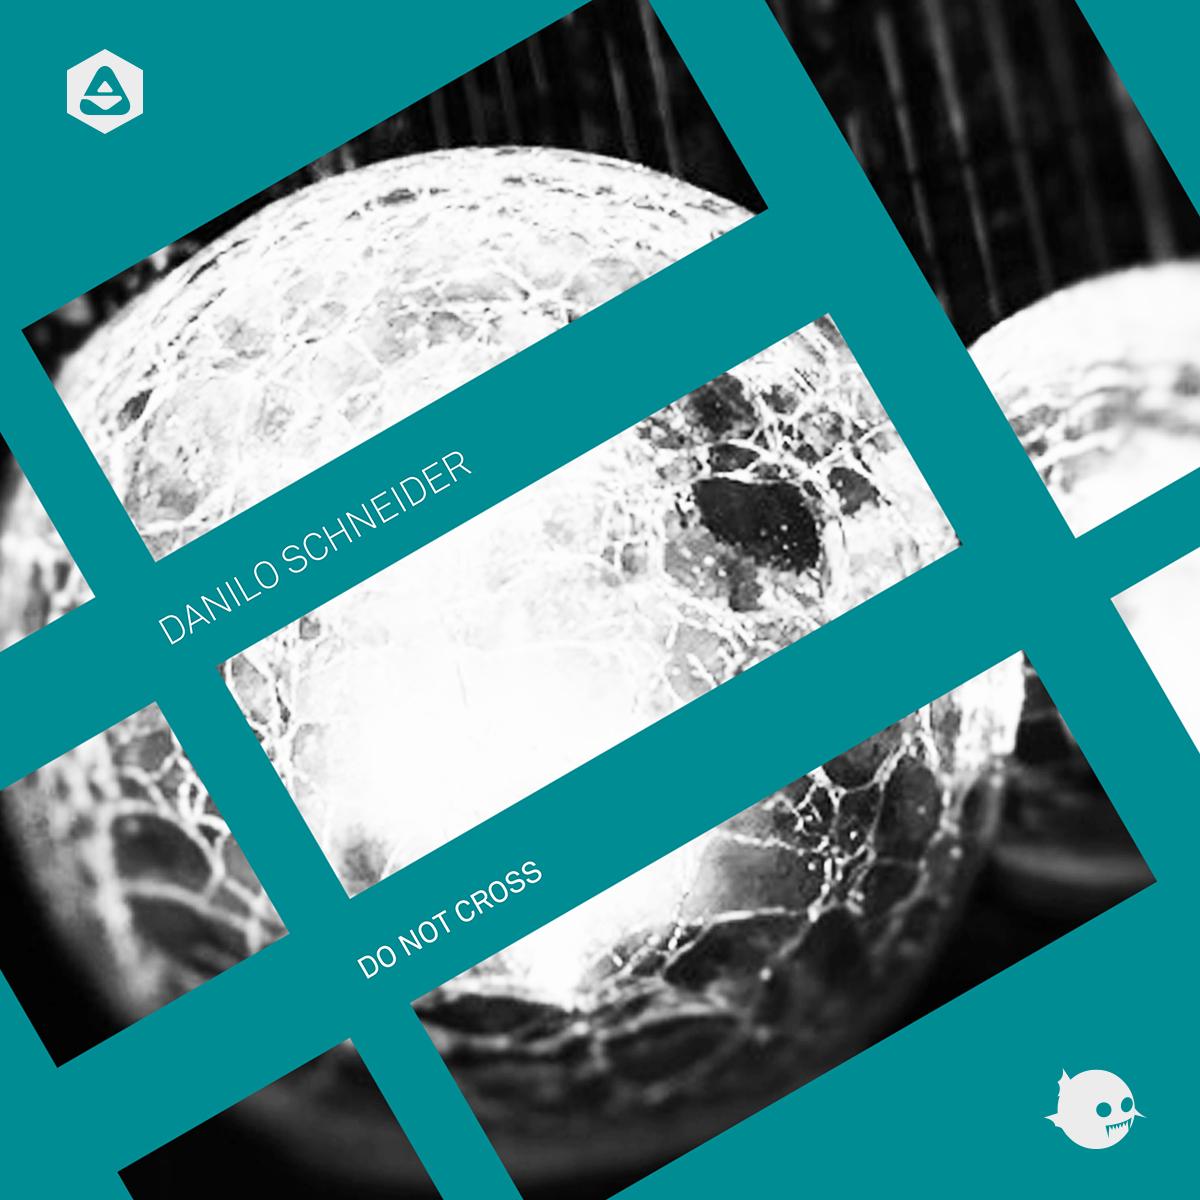 Danilo Schneider - Satellite Storm [Enough Music] 01